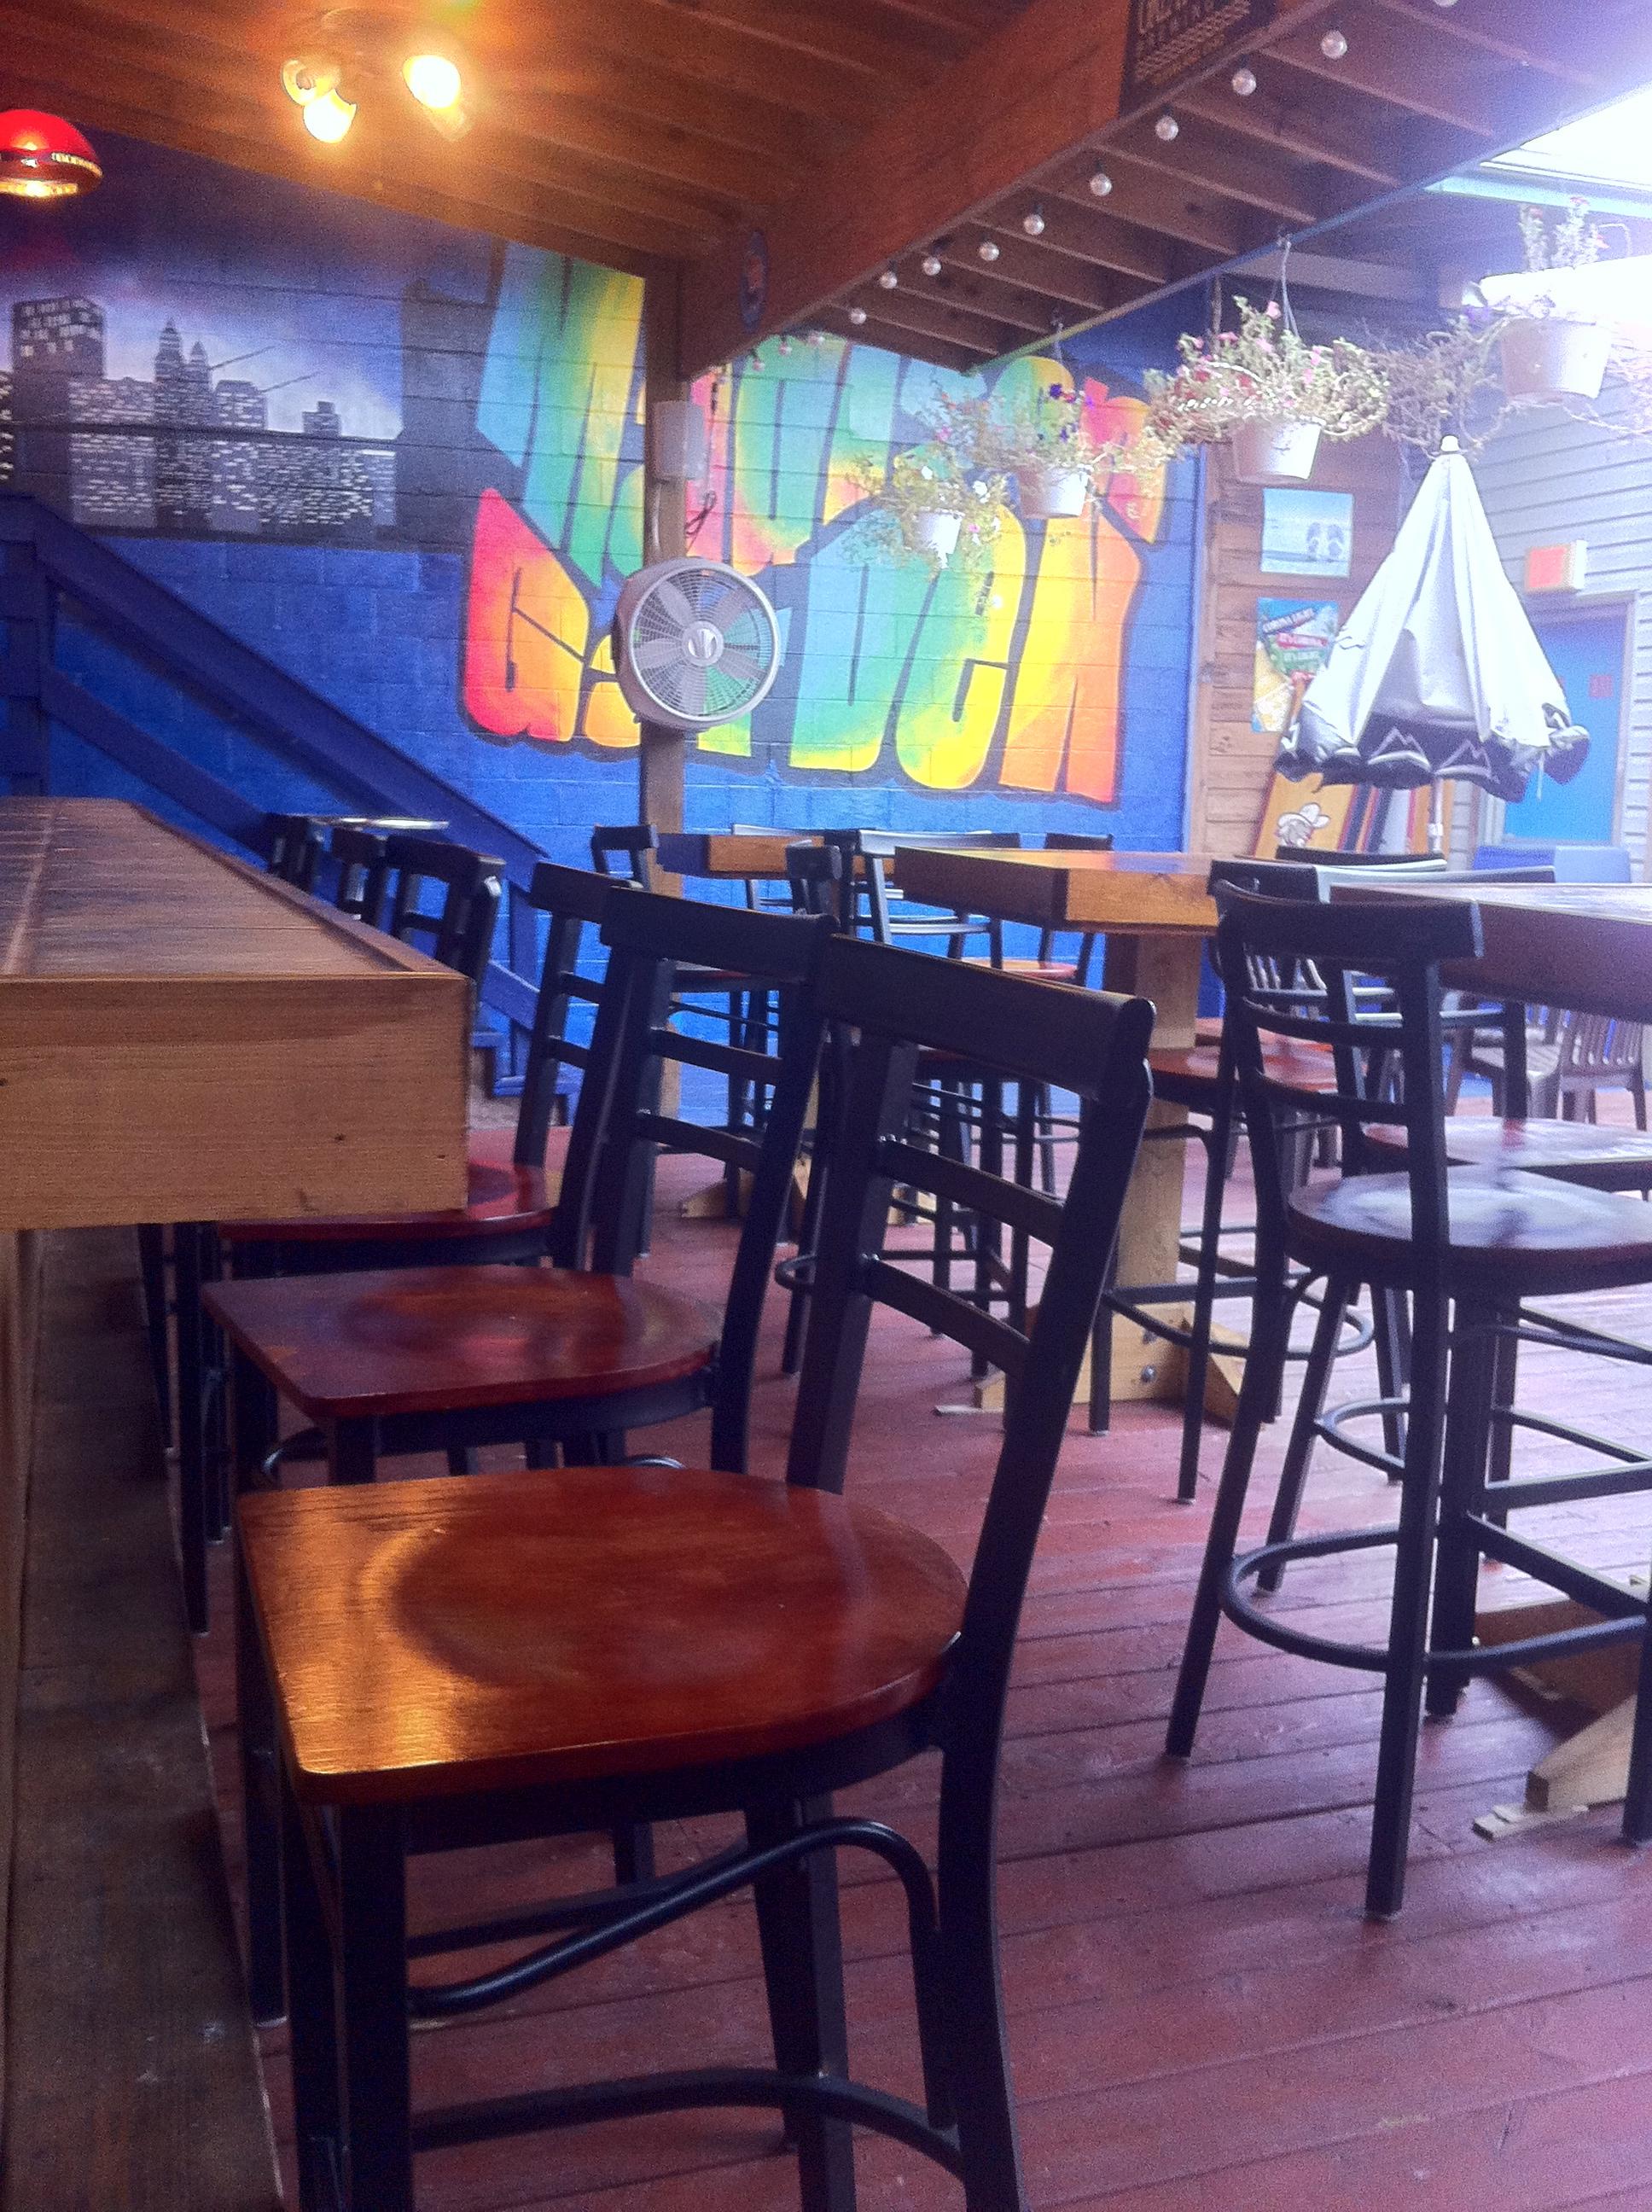 Restaurant Furniture.net Helps, KY Restaurant And Bar Madison Garden  Upgrade Its Image